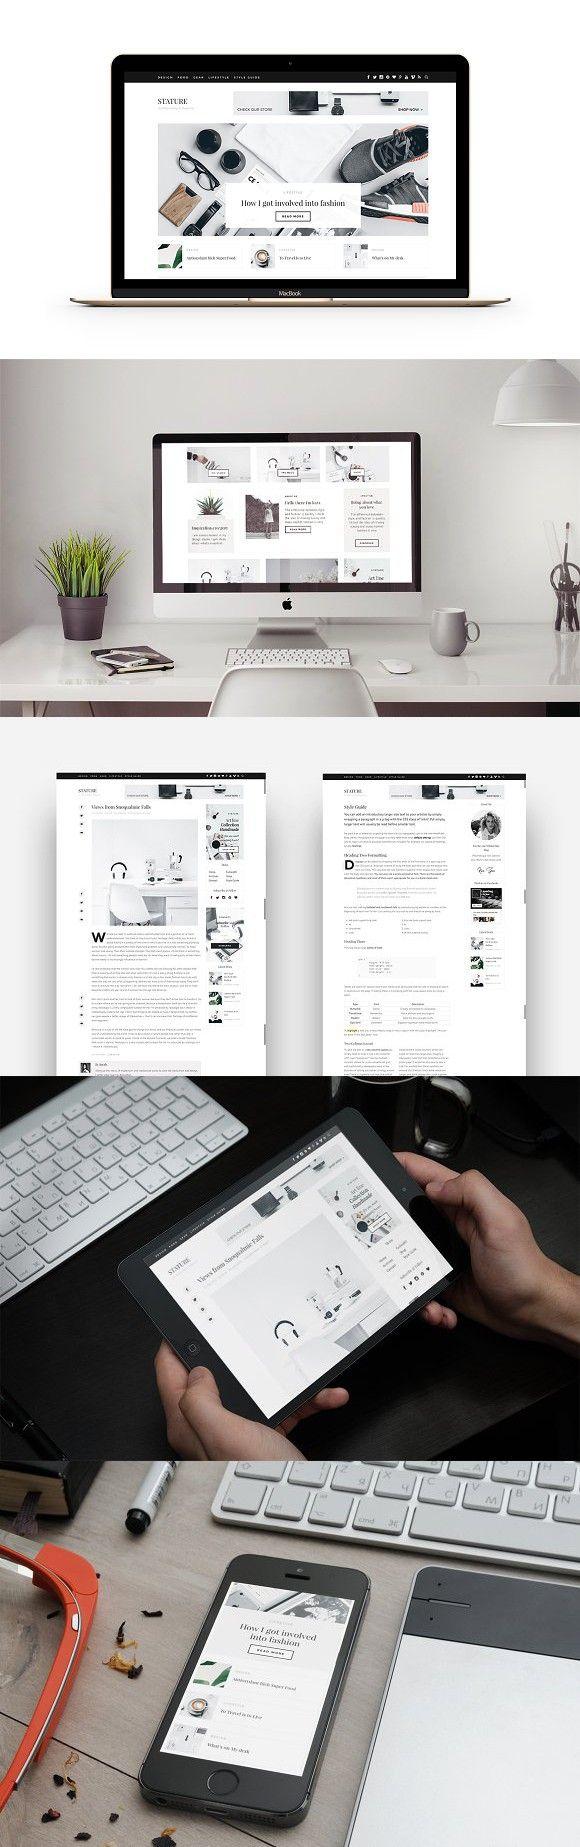 40% Off - Stature - Lifestyle Blog. WordPress Magazine Themes. $29.00